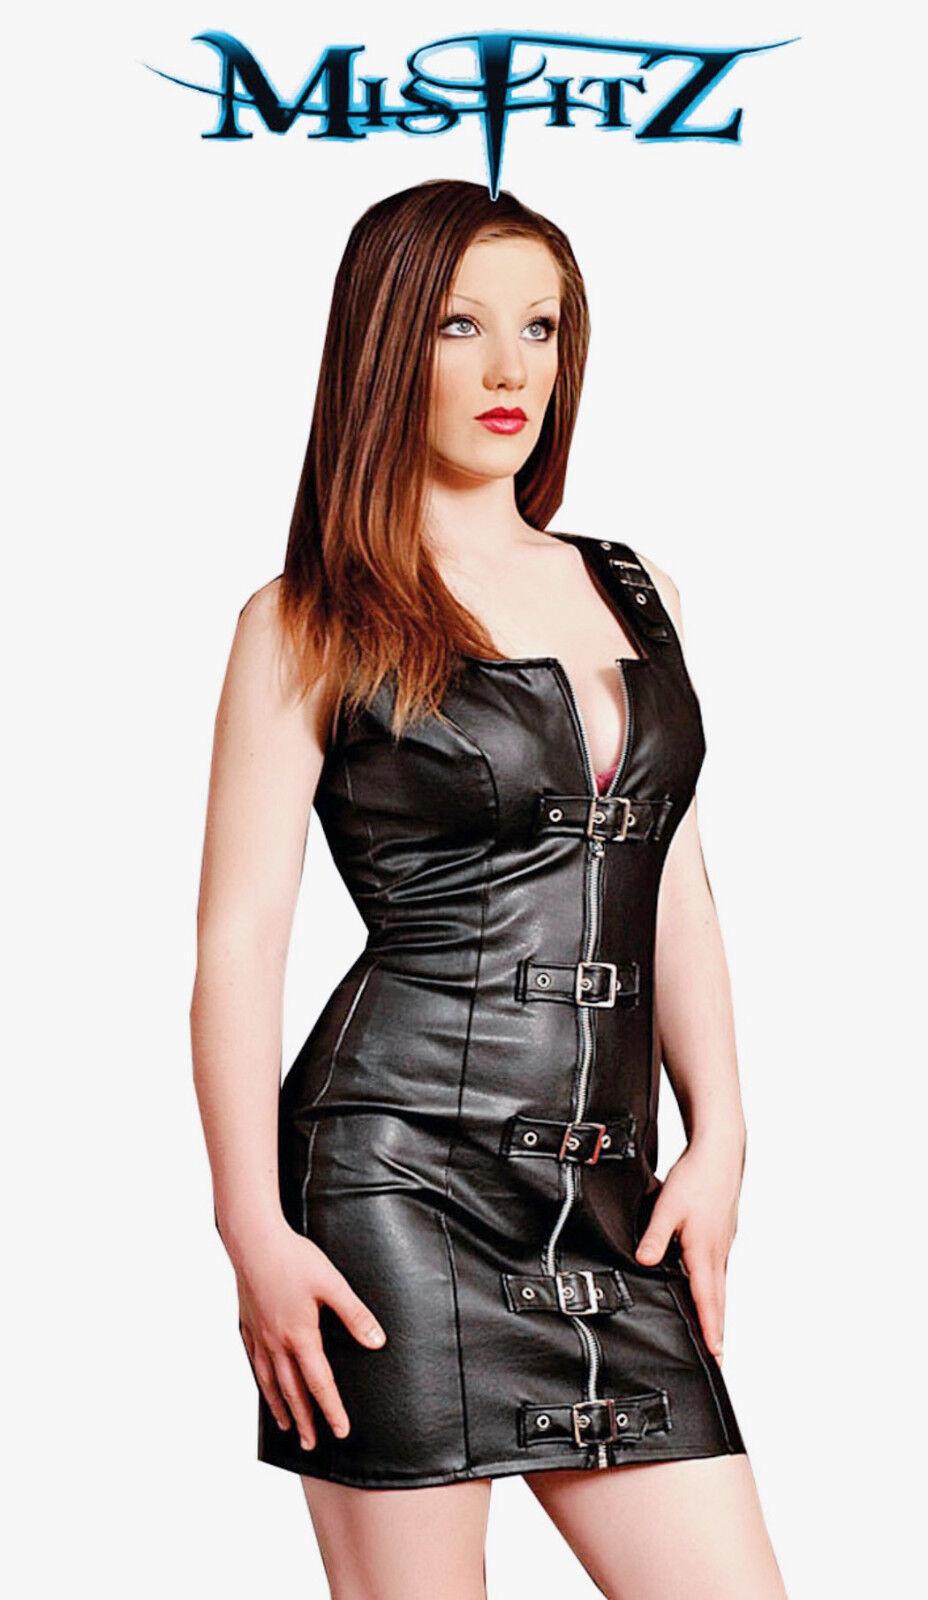 Misfitz Misfitz Misfitz BLK Leather Look Buckle Vestito Taglie 8-32 MADE TO MEASURE Punk Biker Rock 82196b